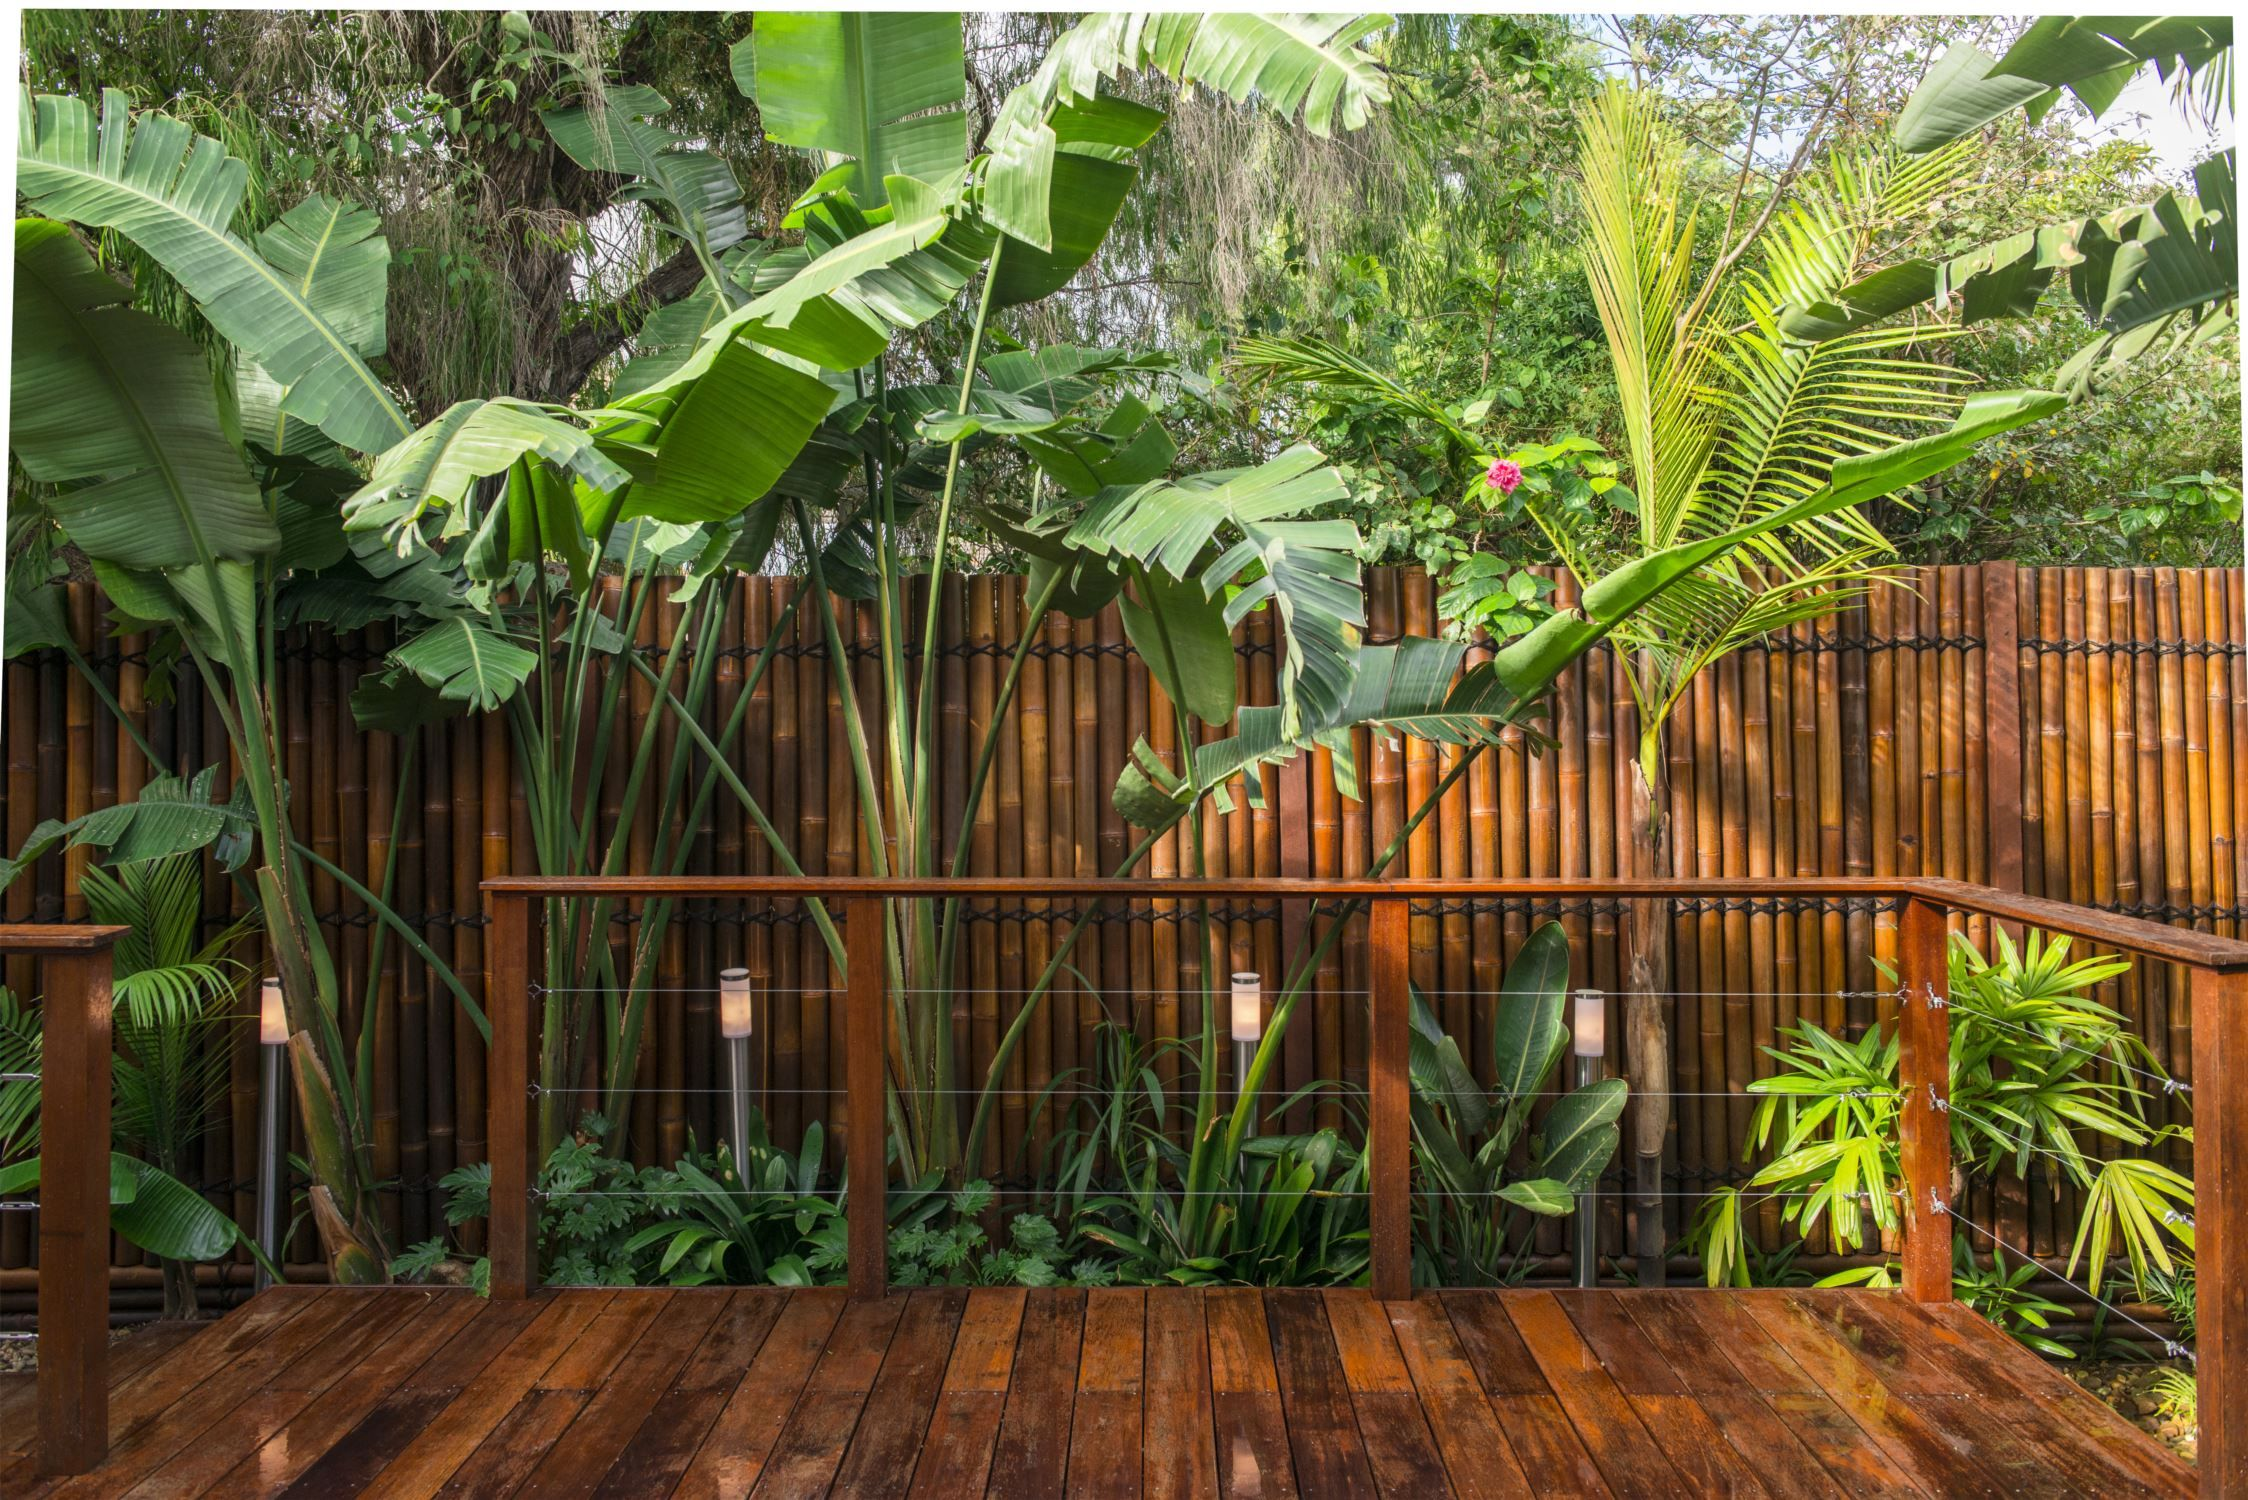 balinese garden ideas | Garden / Outdoor / Water / Plants ...